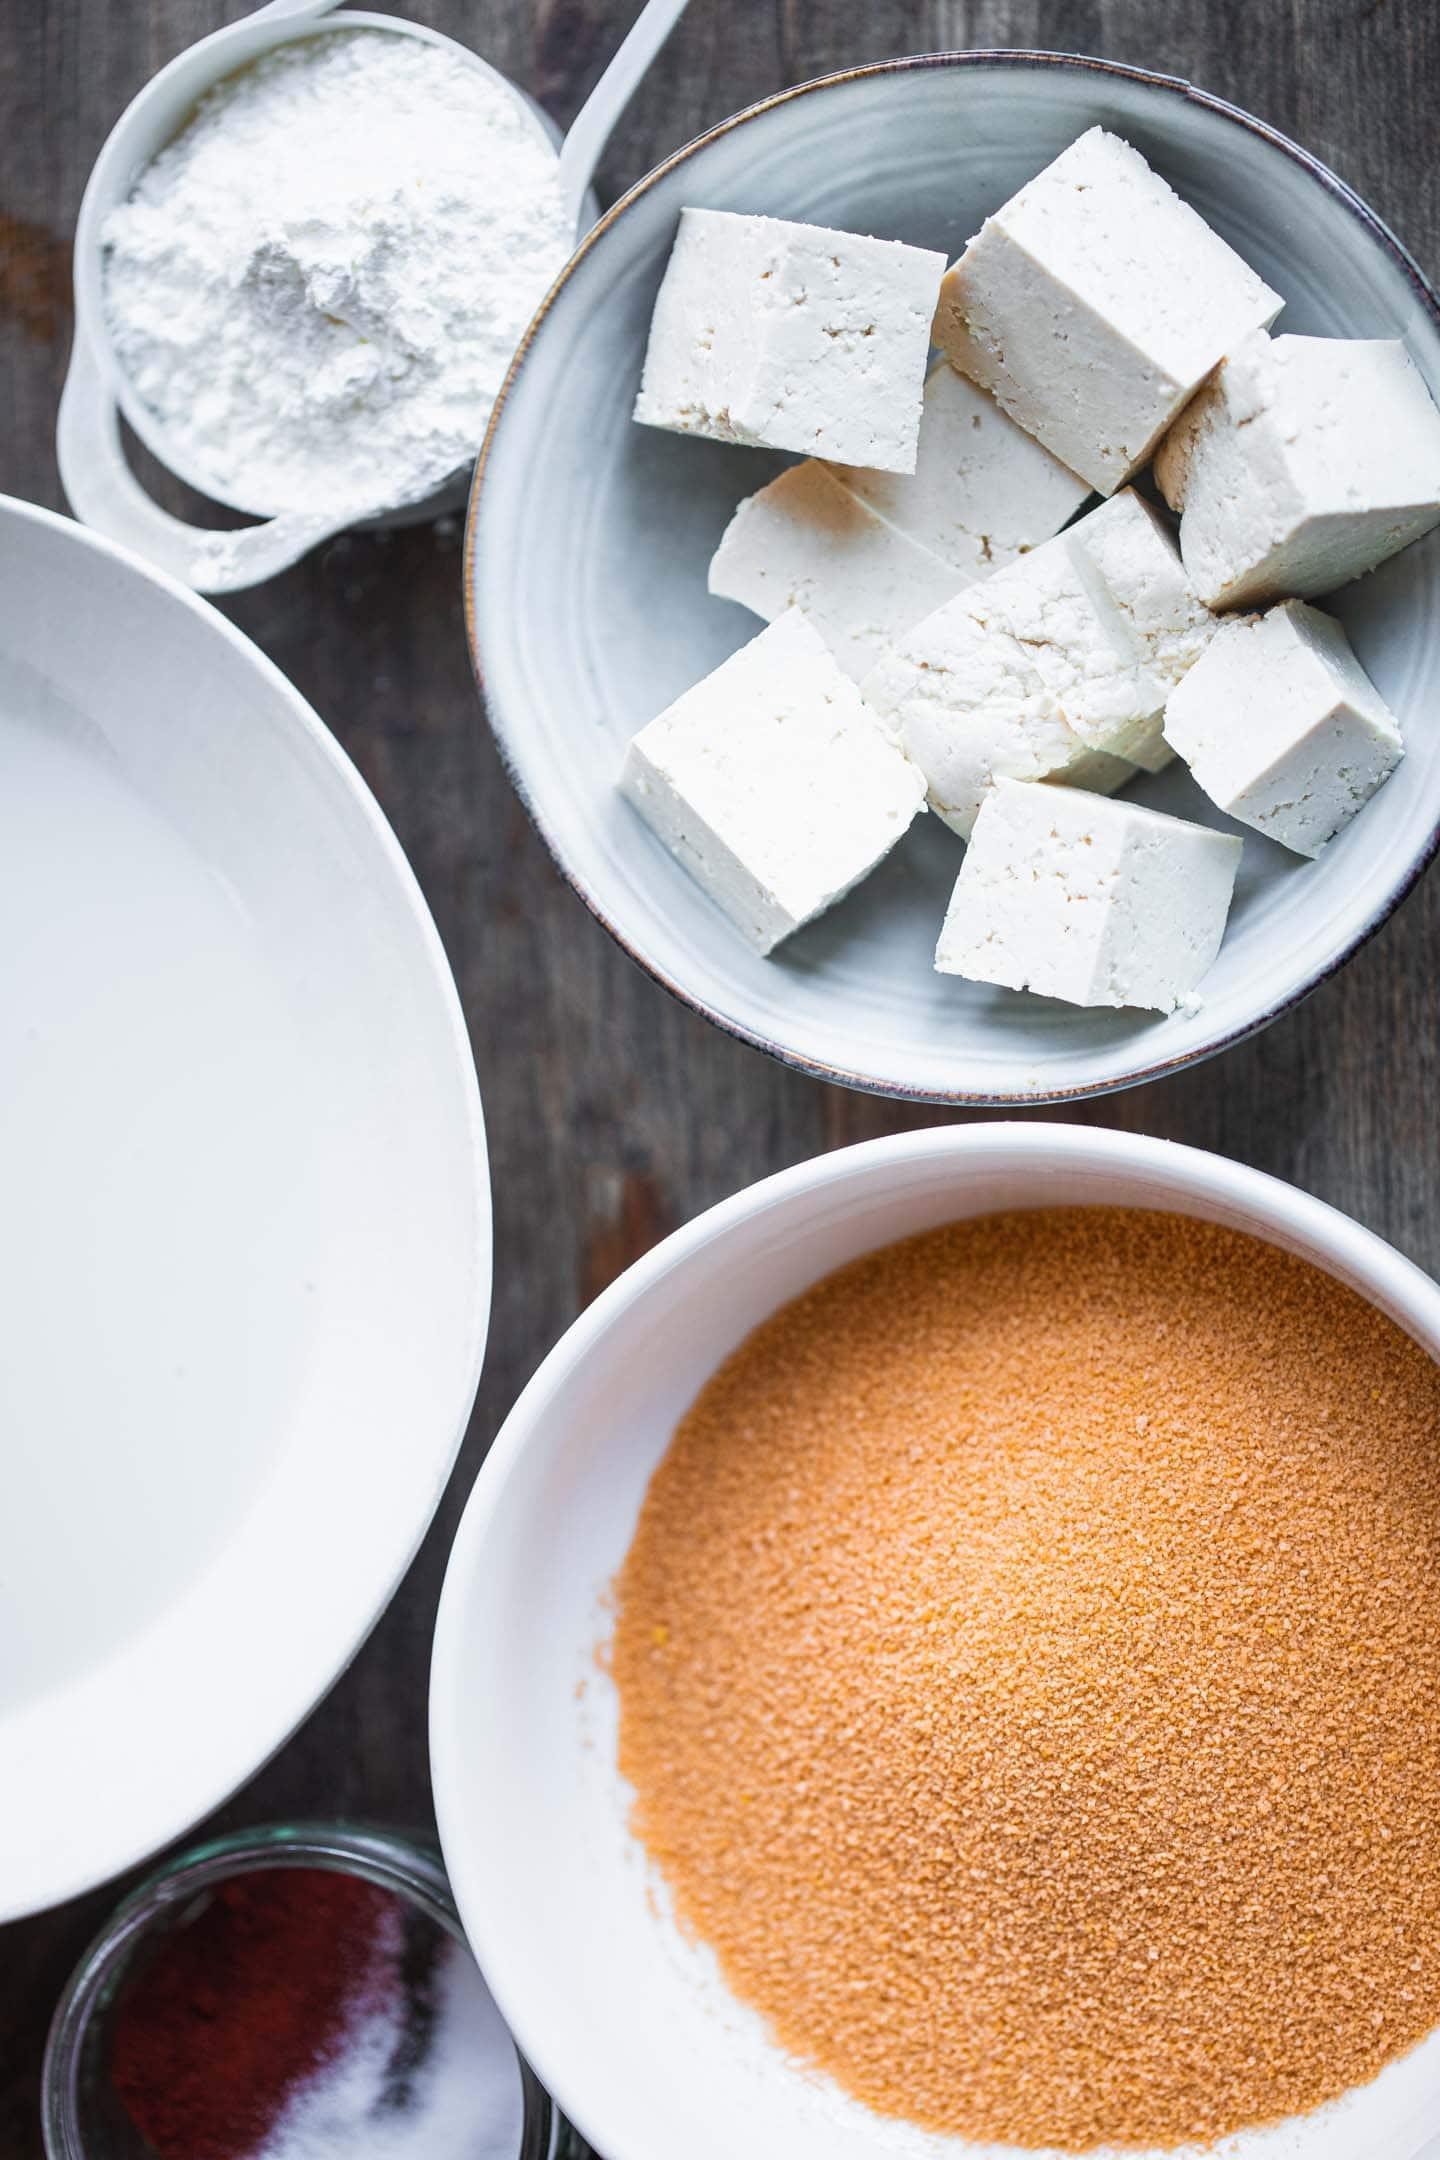 Ingredients for crispy fried tofu